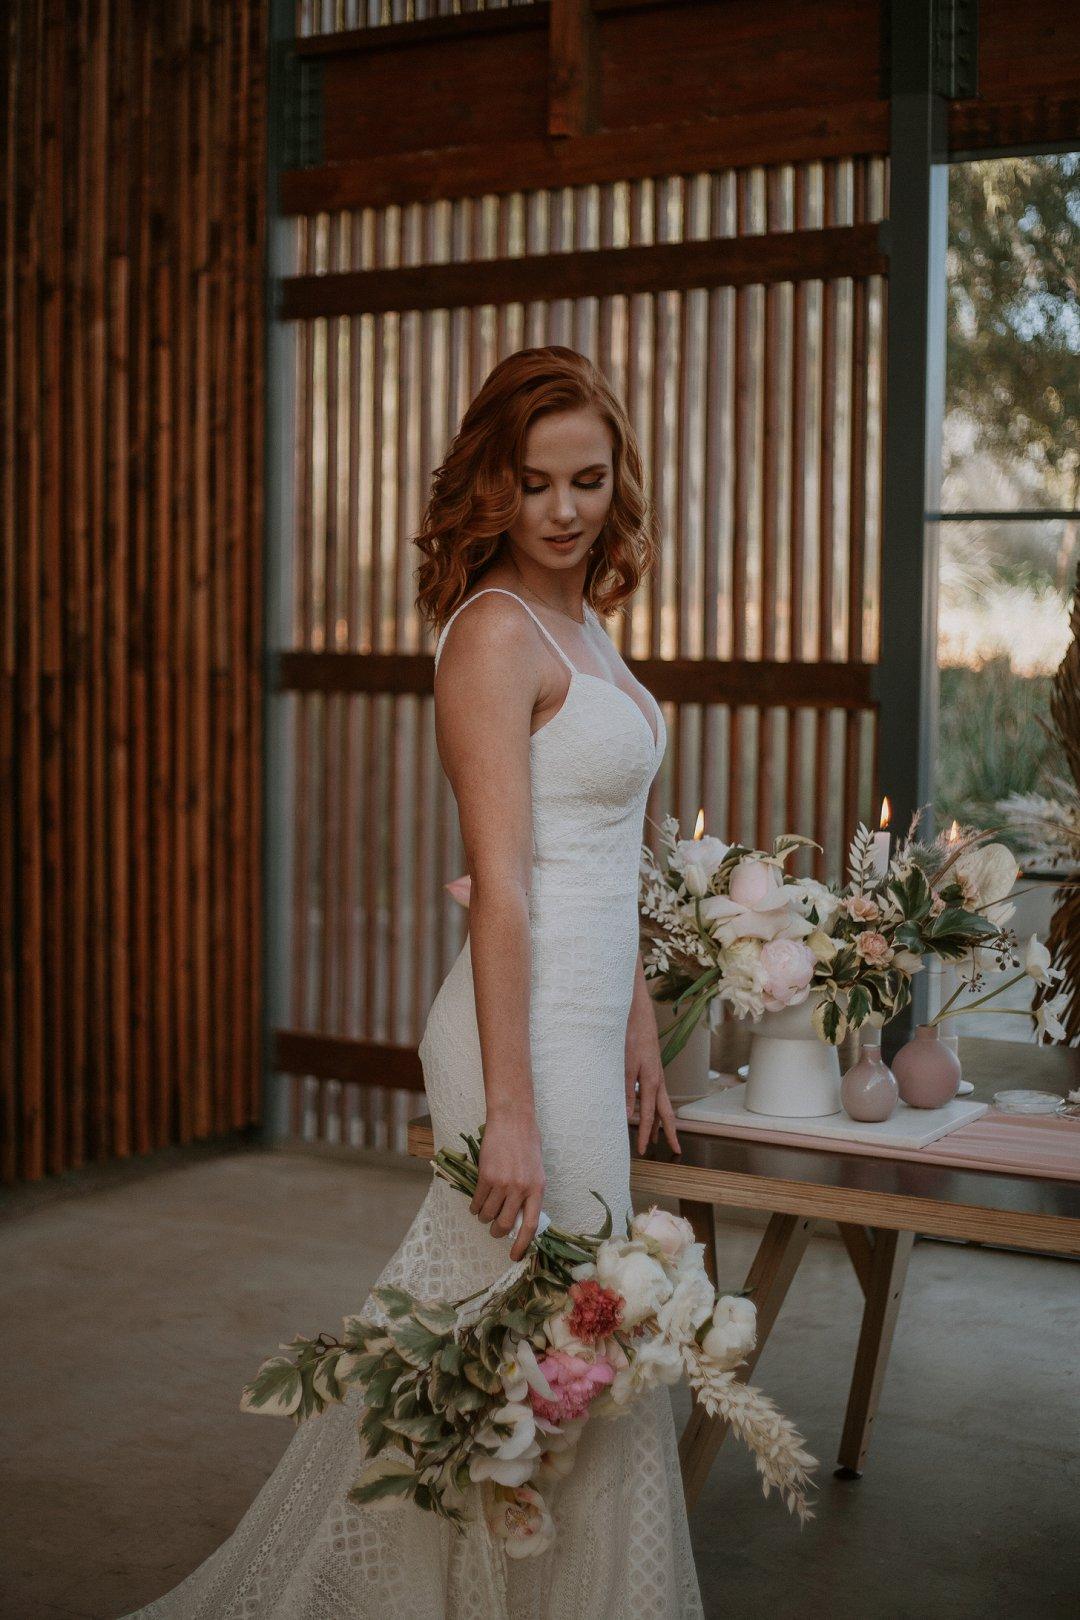 Boho wedding decor ideas